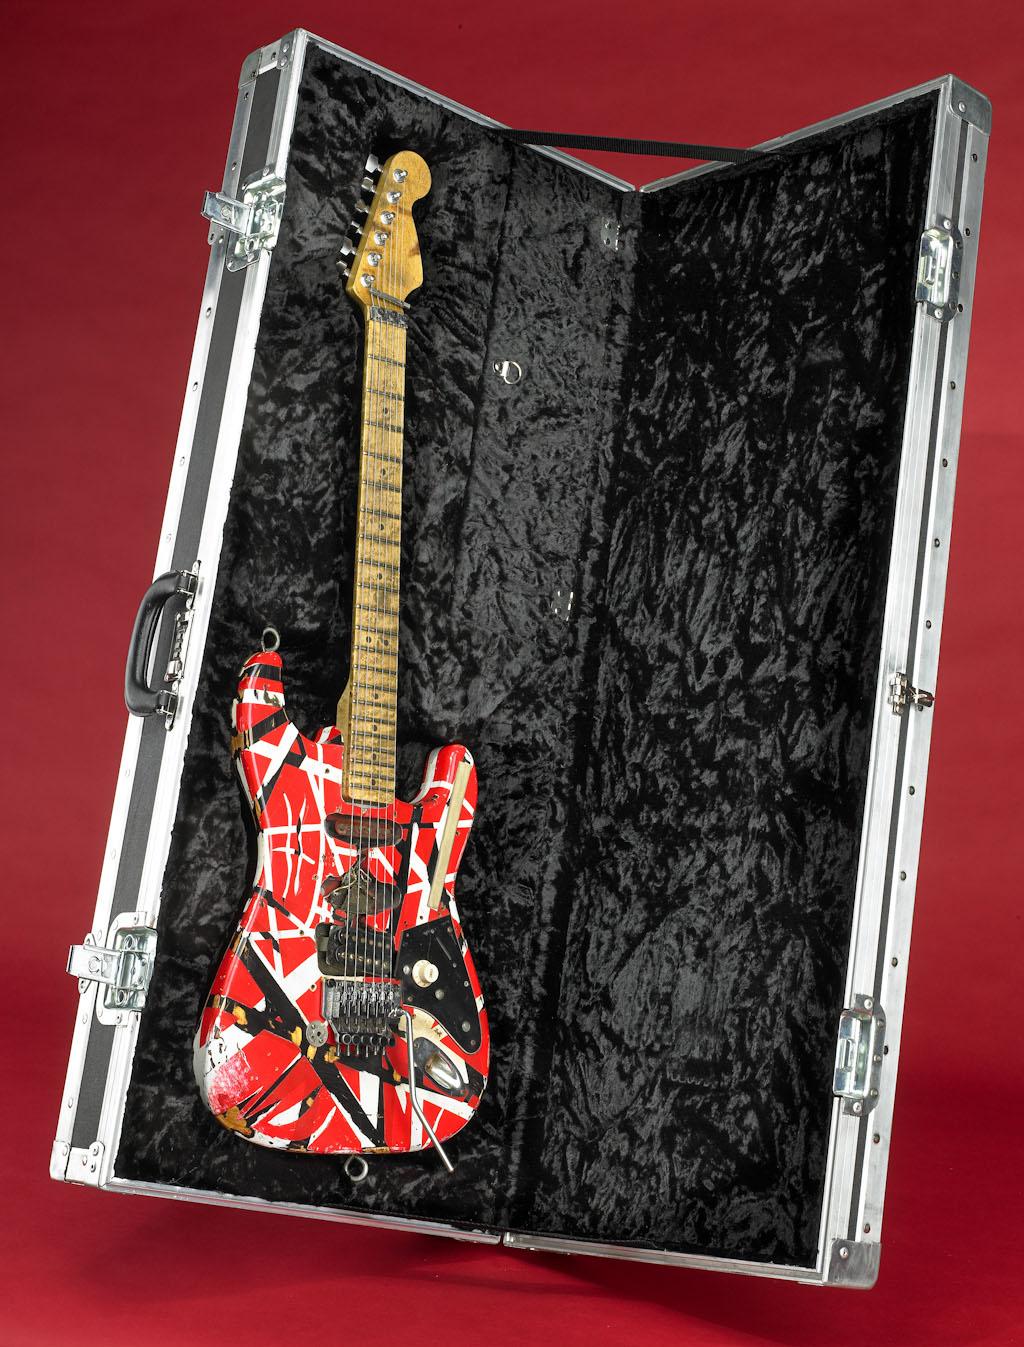 national museum of american history receives eddie van halen s frankenstein replica guitar. Black Bedroom Furniture Sets. Home Design Ideas